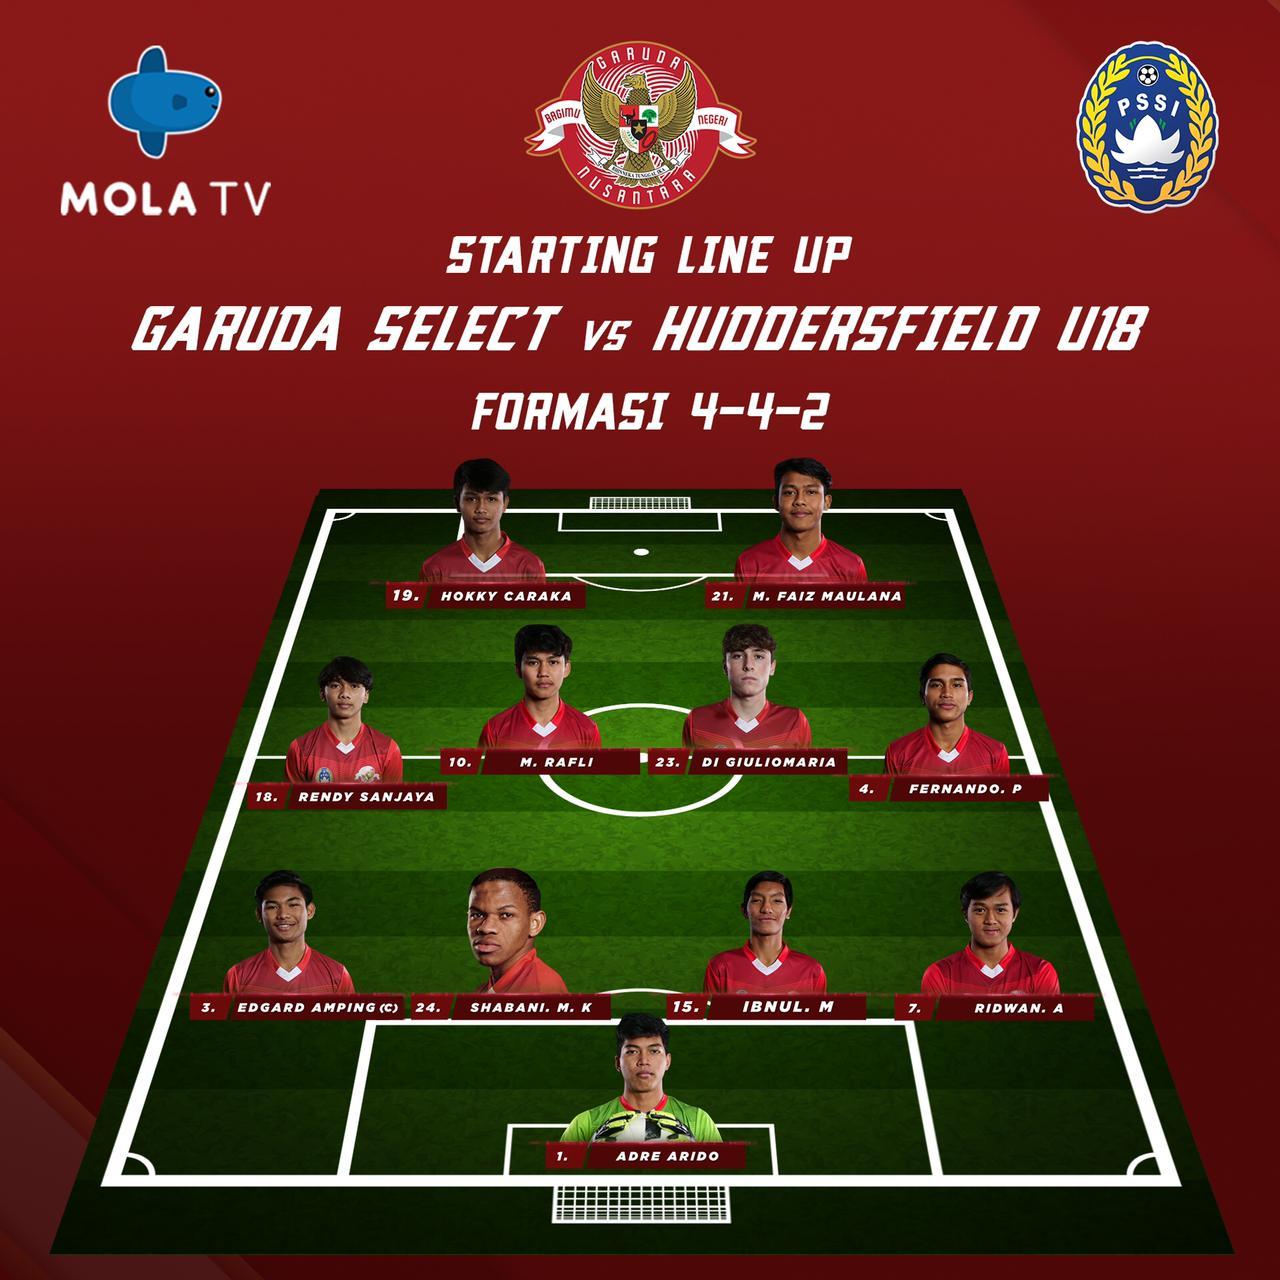 Starting Line Up Garuda Select Lawan Huddersfield U18